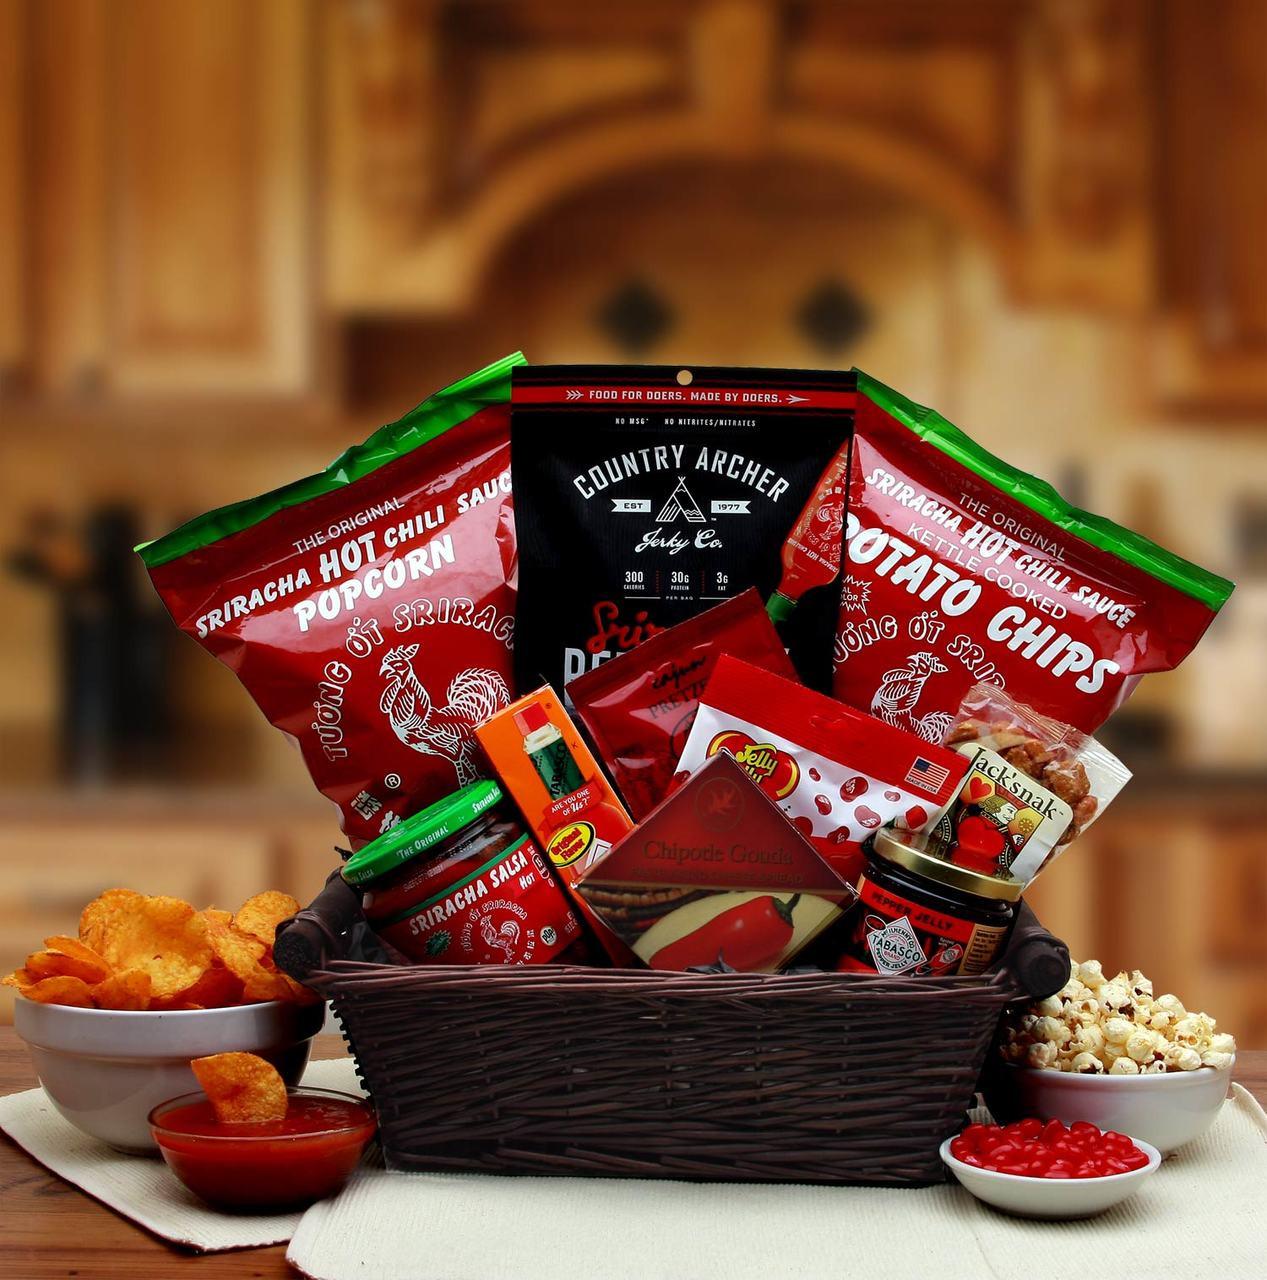 & Hot u0026 Spicy Sriracha Lovers Gift Basket - Baskets-n-Beyond